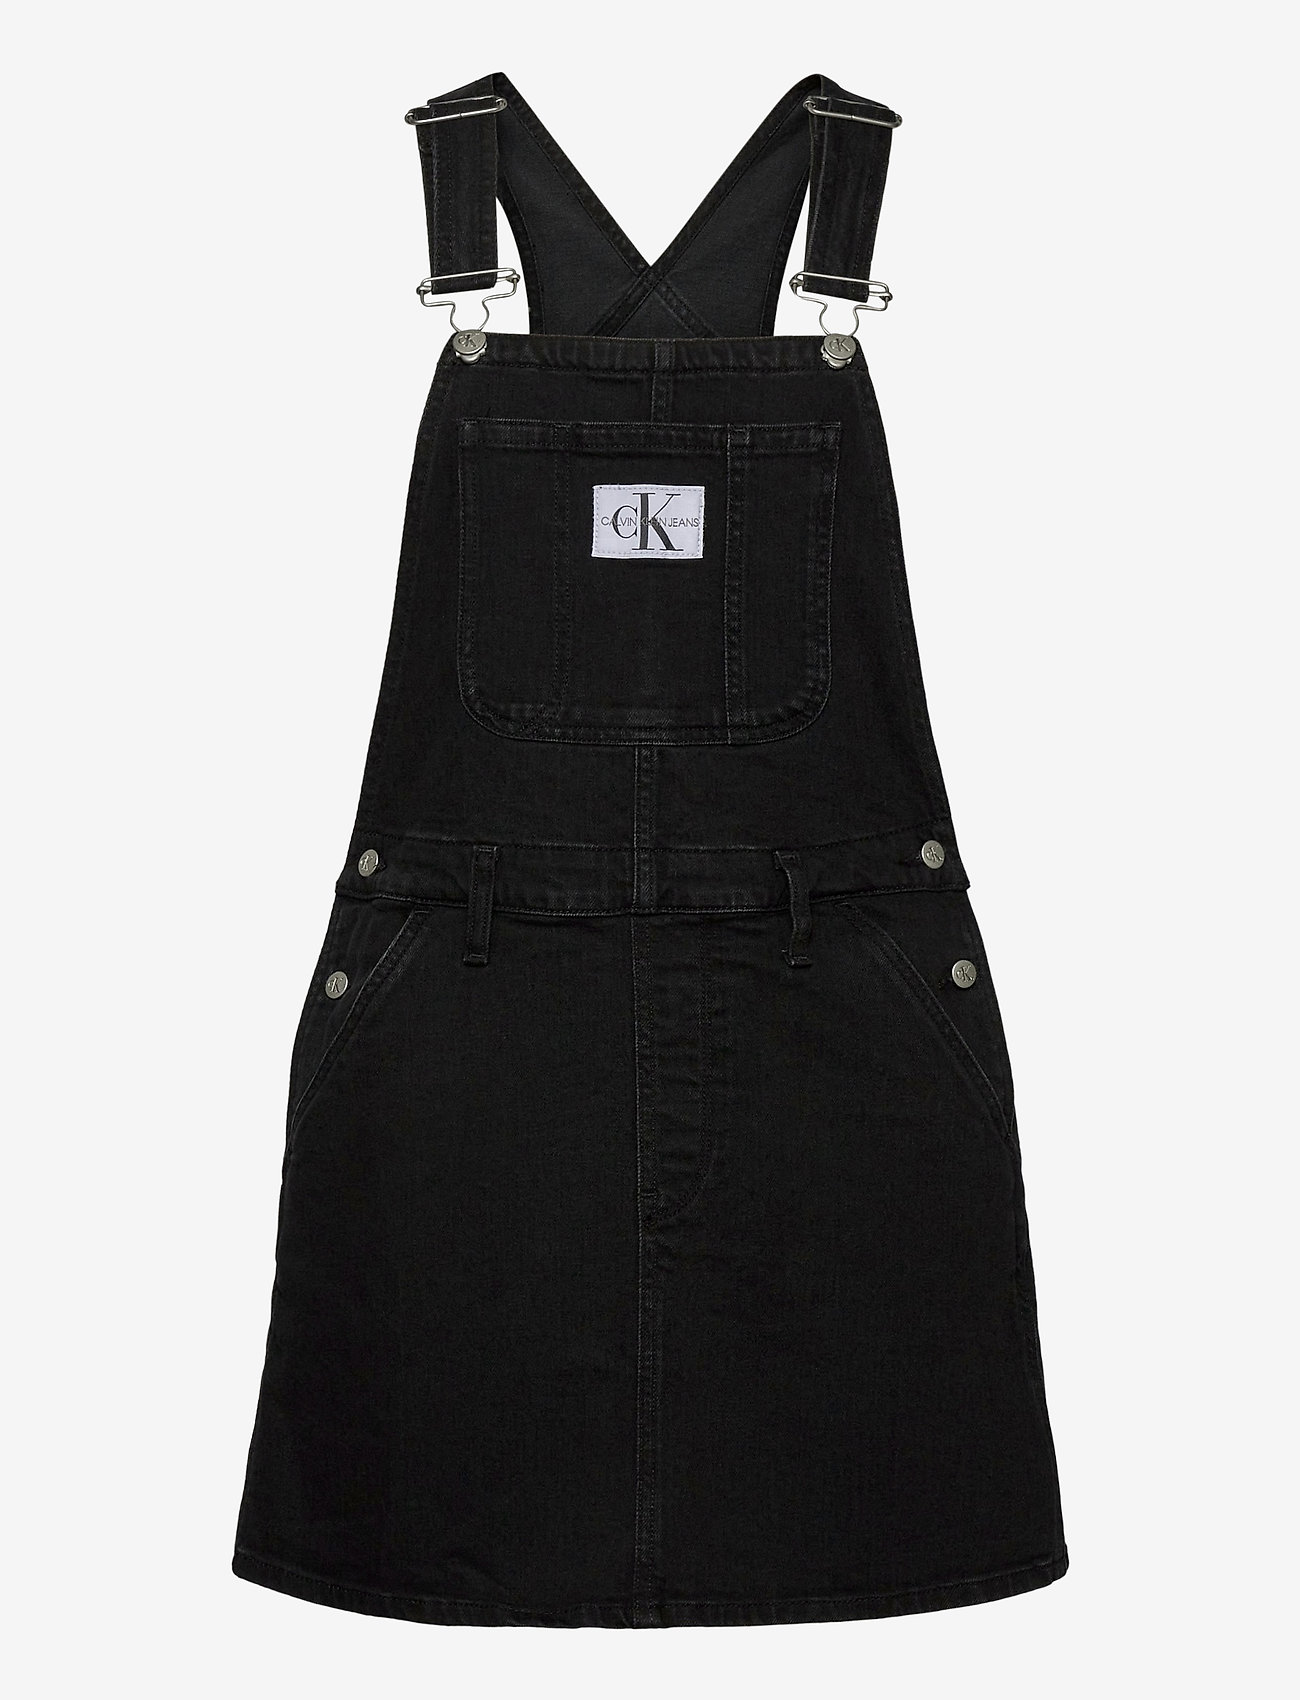 Calvin Klein Jeans - OVERALL DRESS - denimkjoler - ab117 washed black - 0